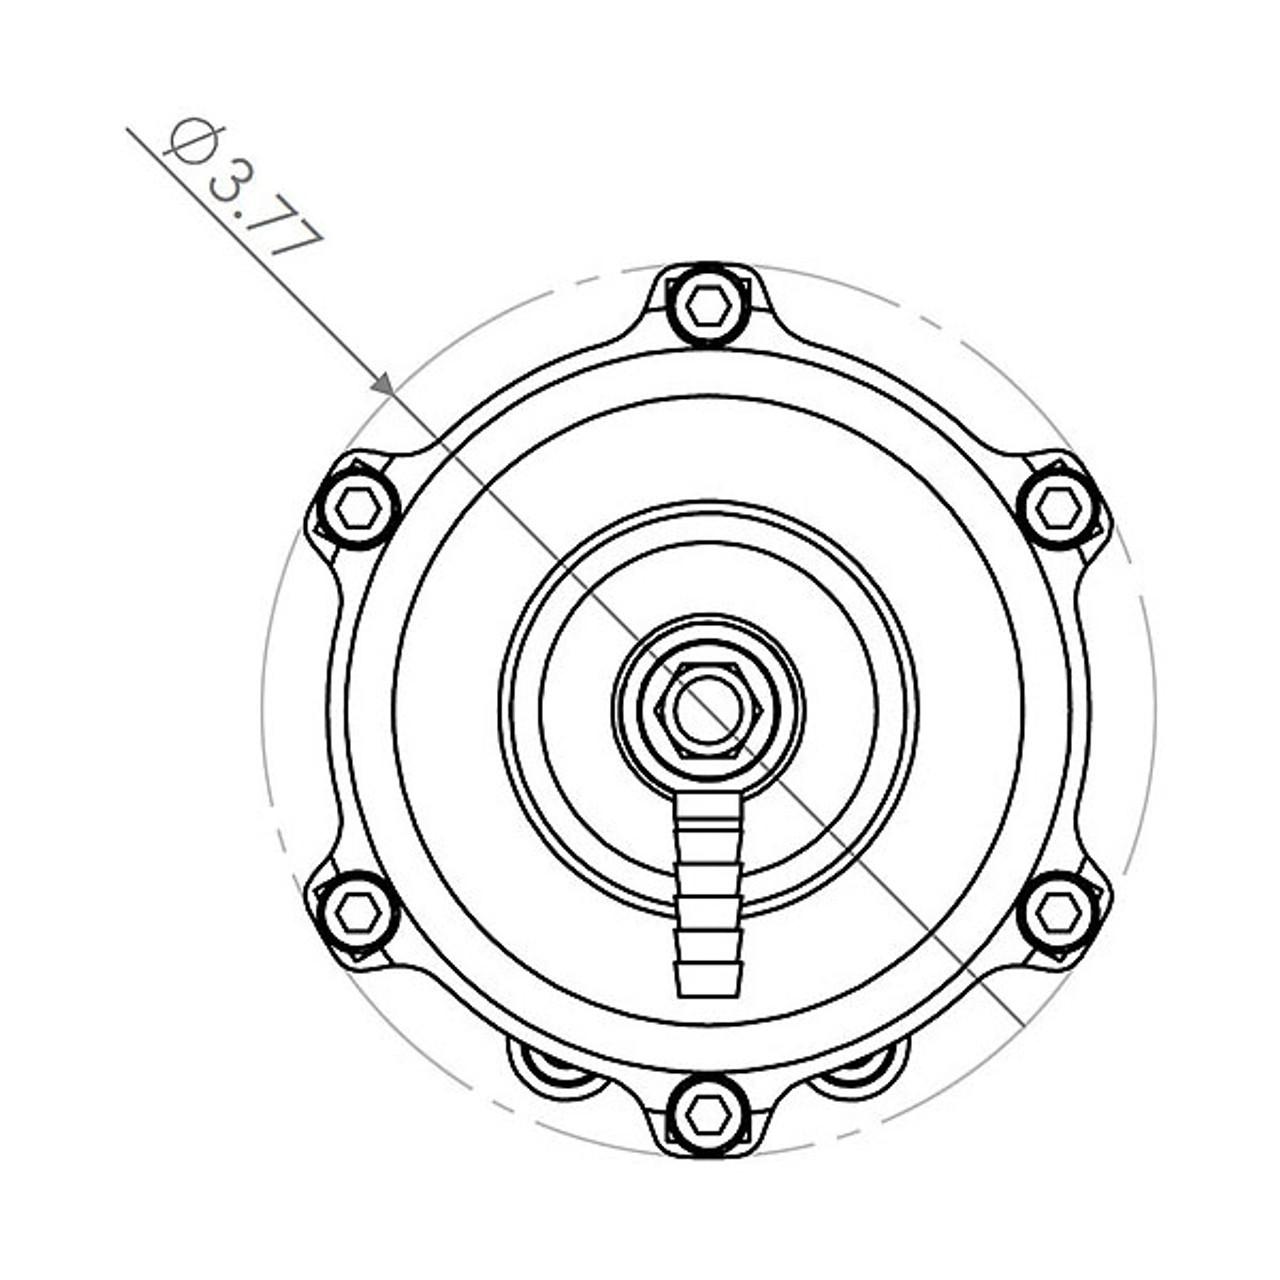 Tial 002576 Q 2 50 Mm Blow Off Valve Silver Color 2 Psi